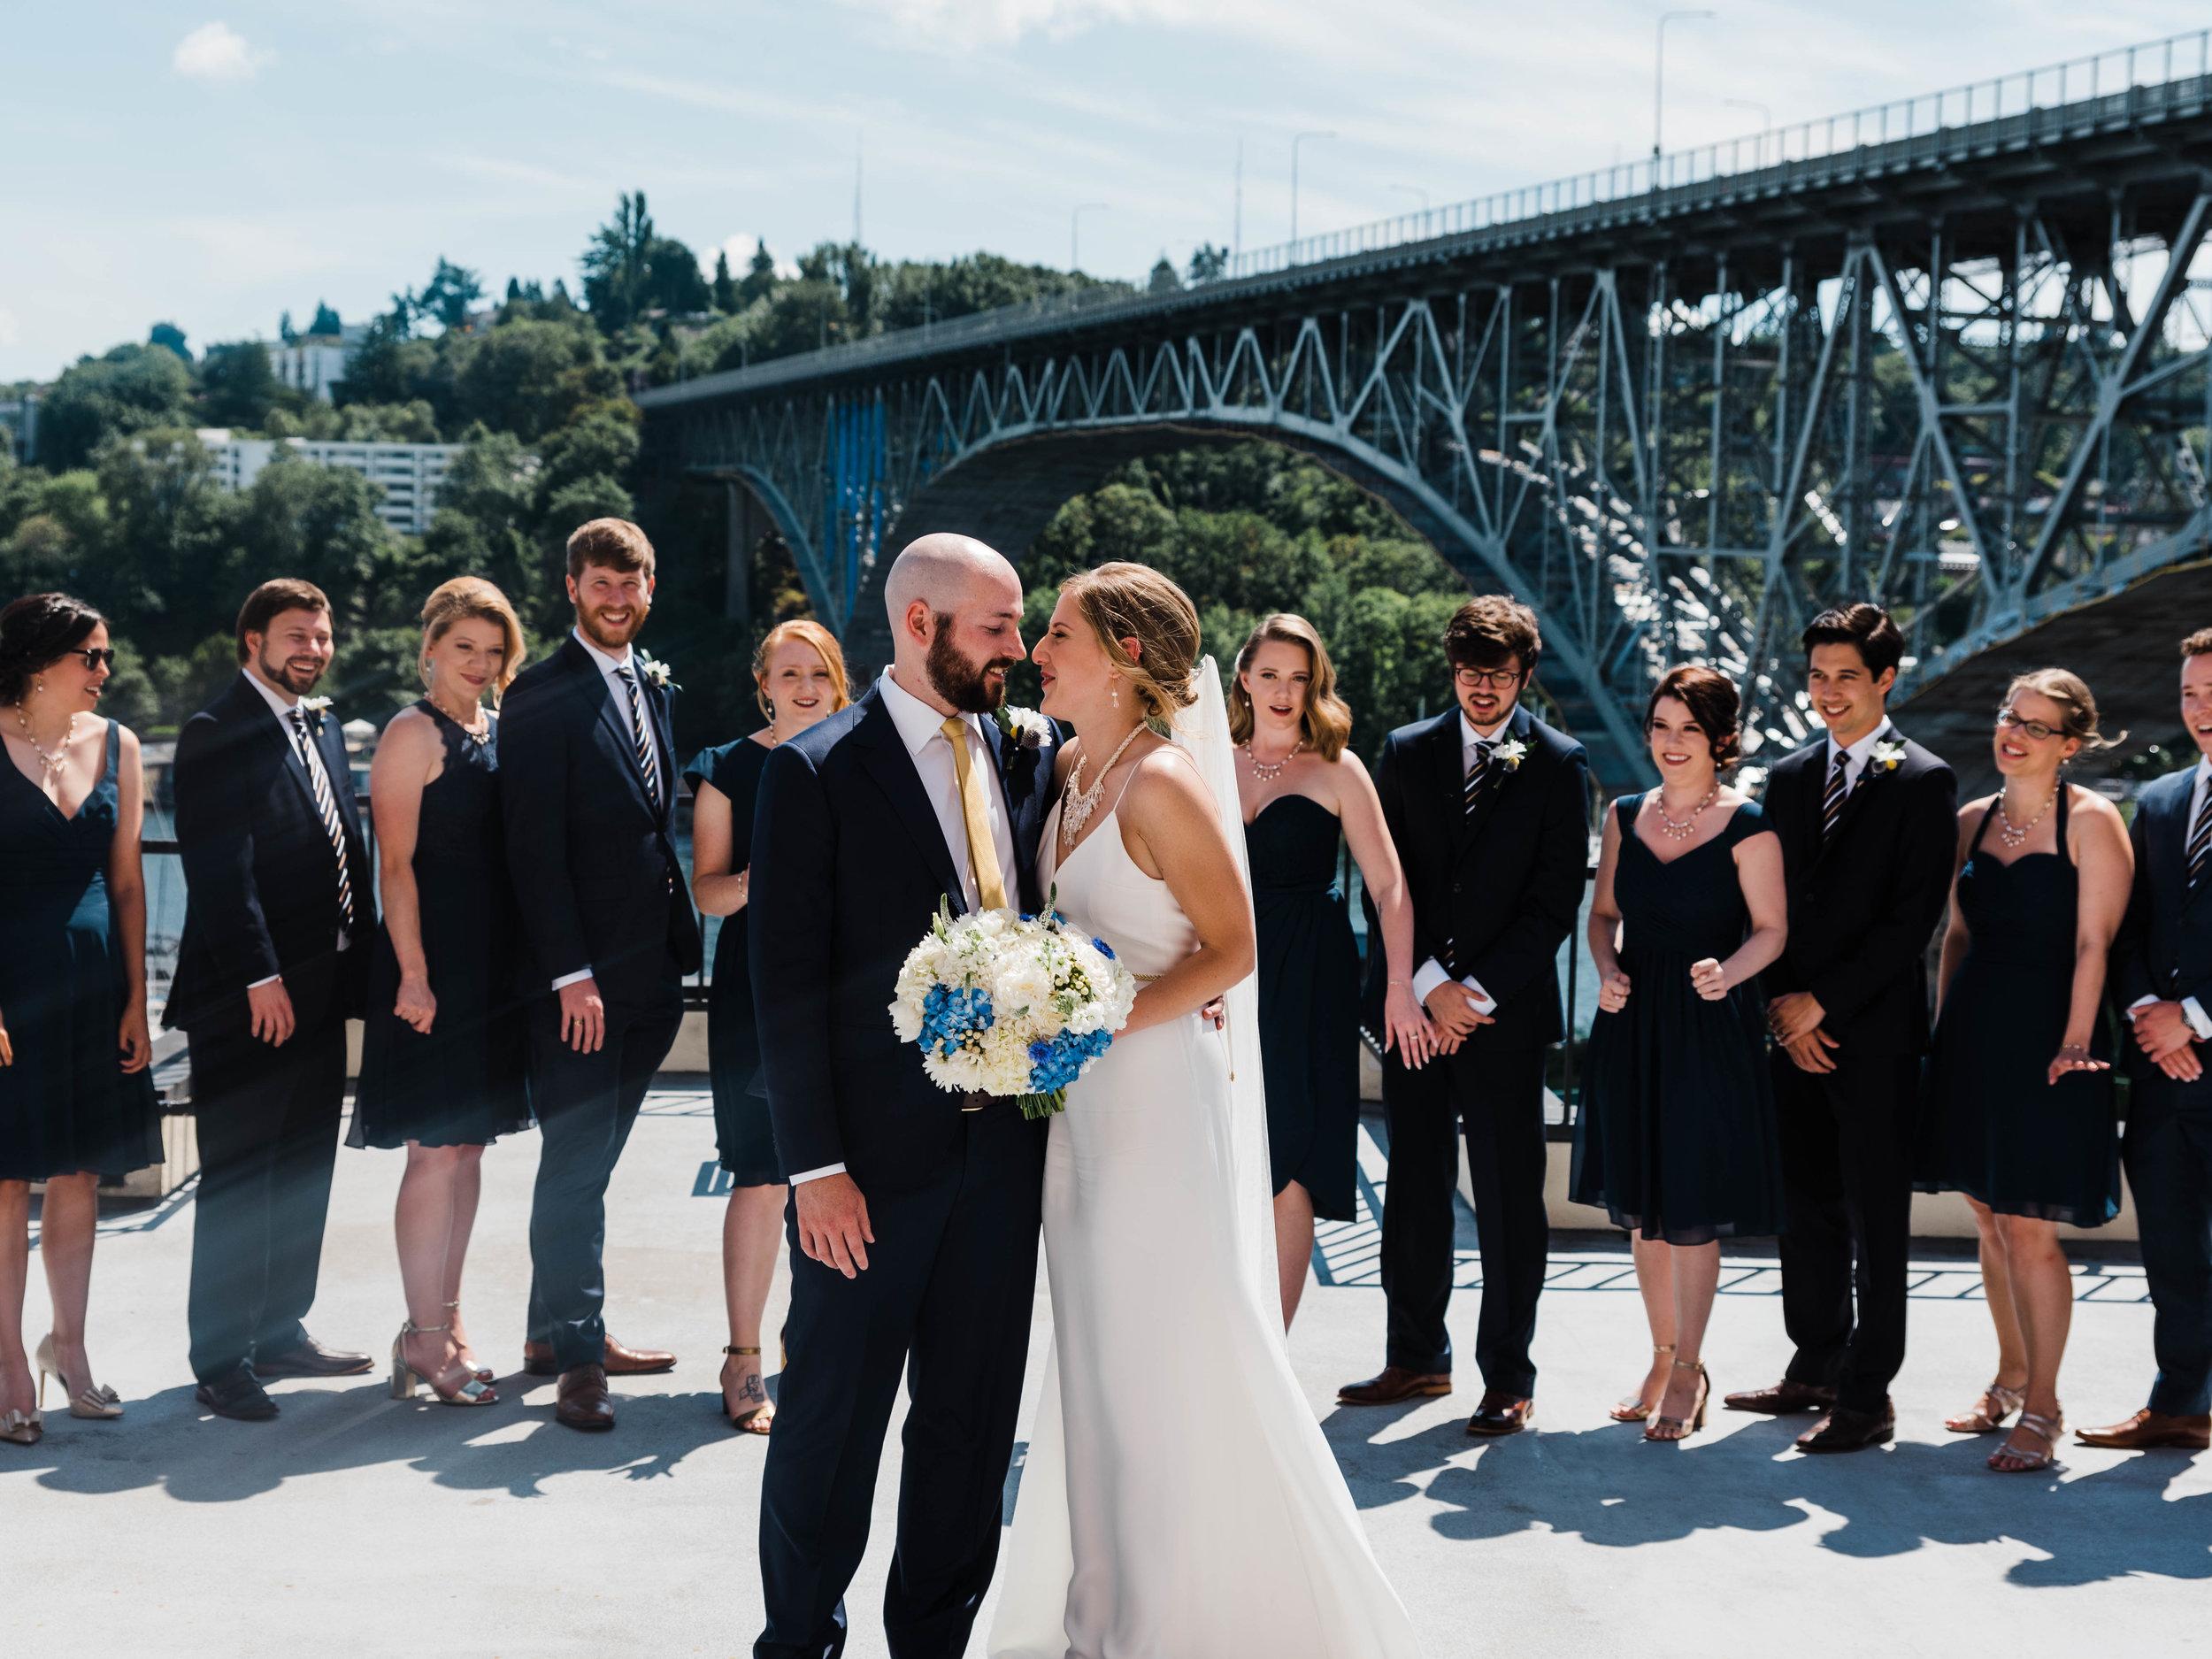 Seattle Wedding- MV Skansonia - Anna + Josh -  (525) - Copy.jpg